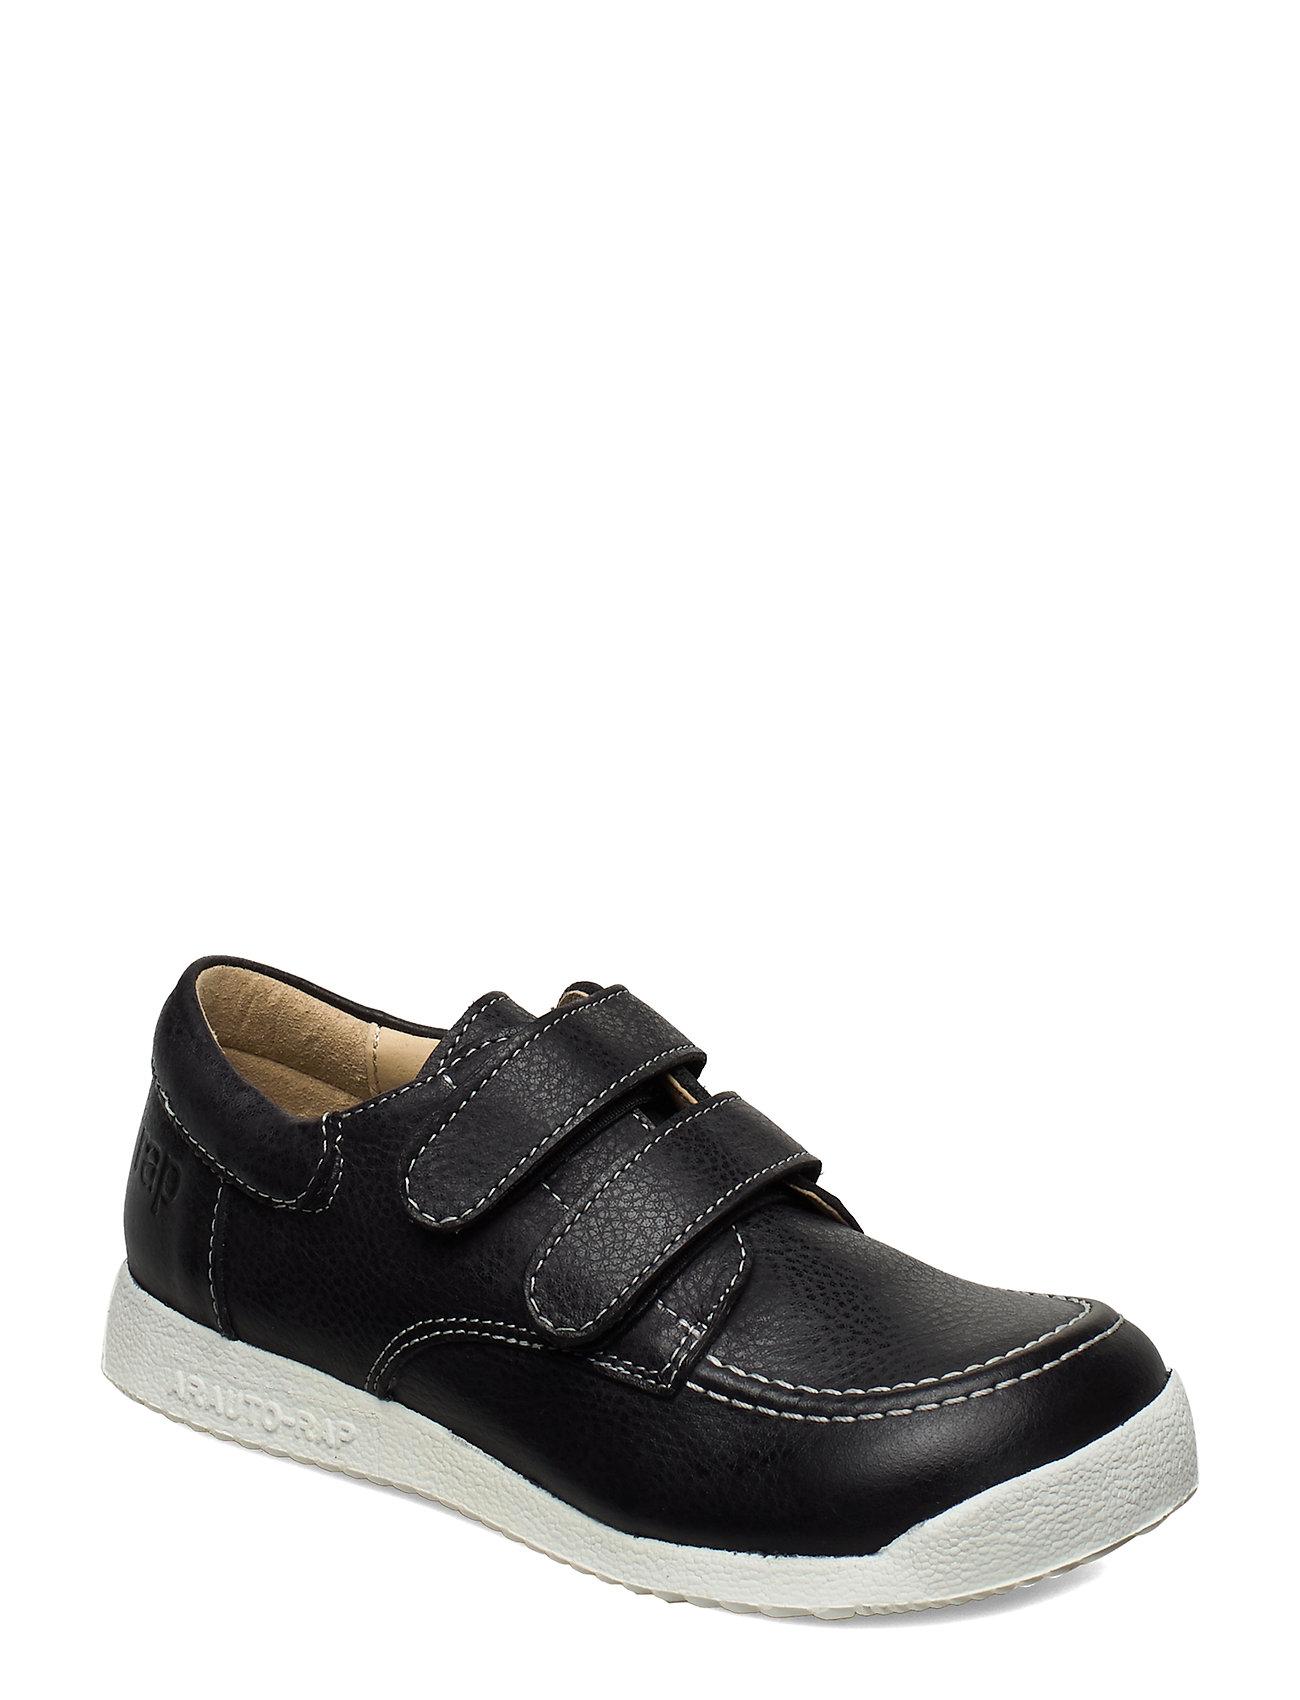 Image of Hand Made Shoe Sneakers Sko Sort Arauto RAP (3350778977)